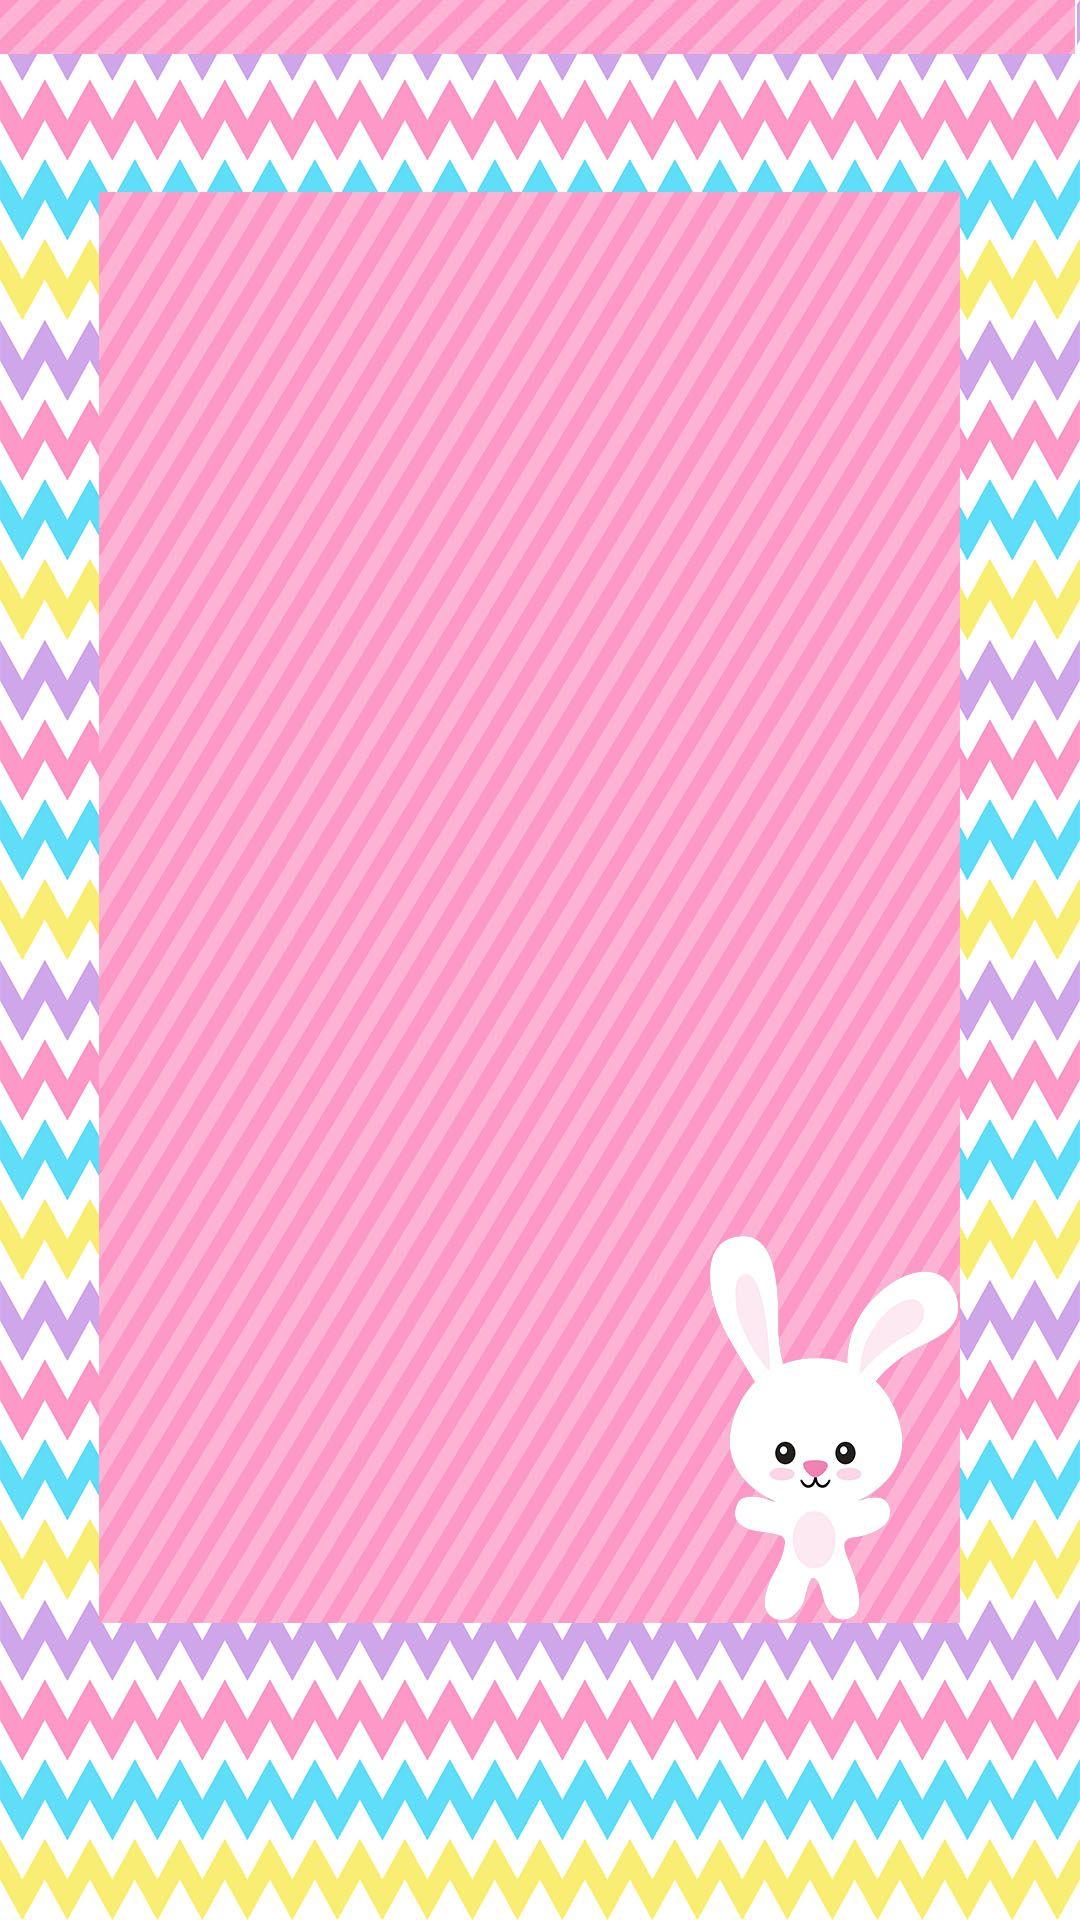 Pastel Freebie 4 Bunny wallpaper, Android wallpaper